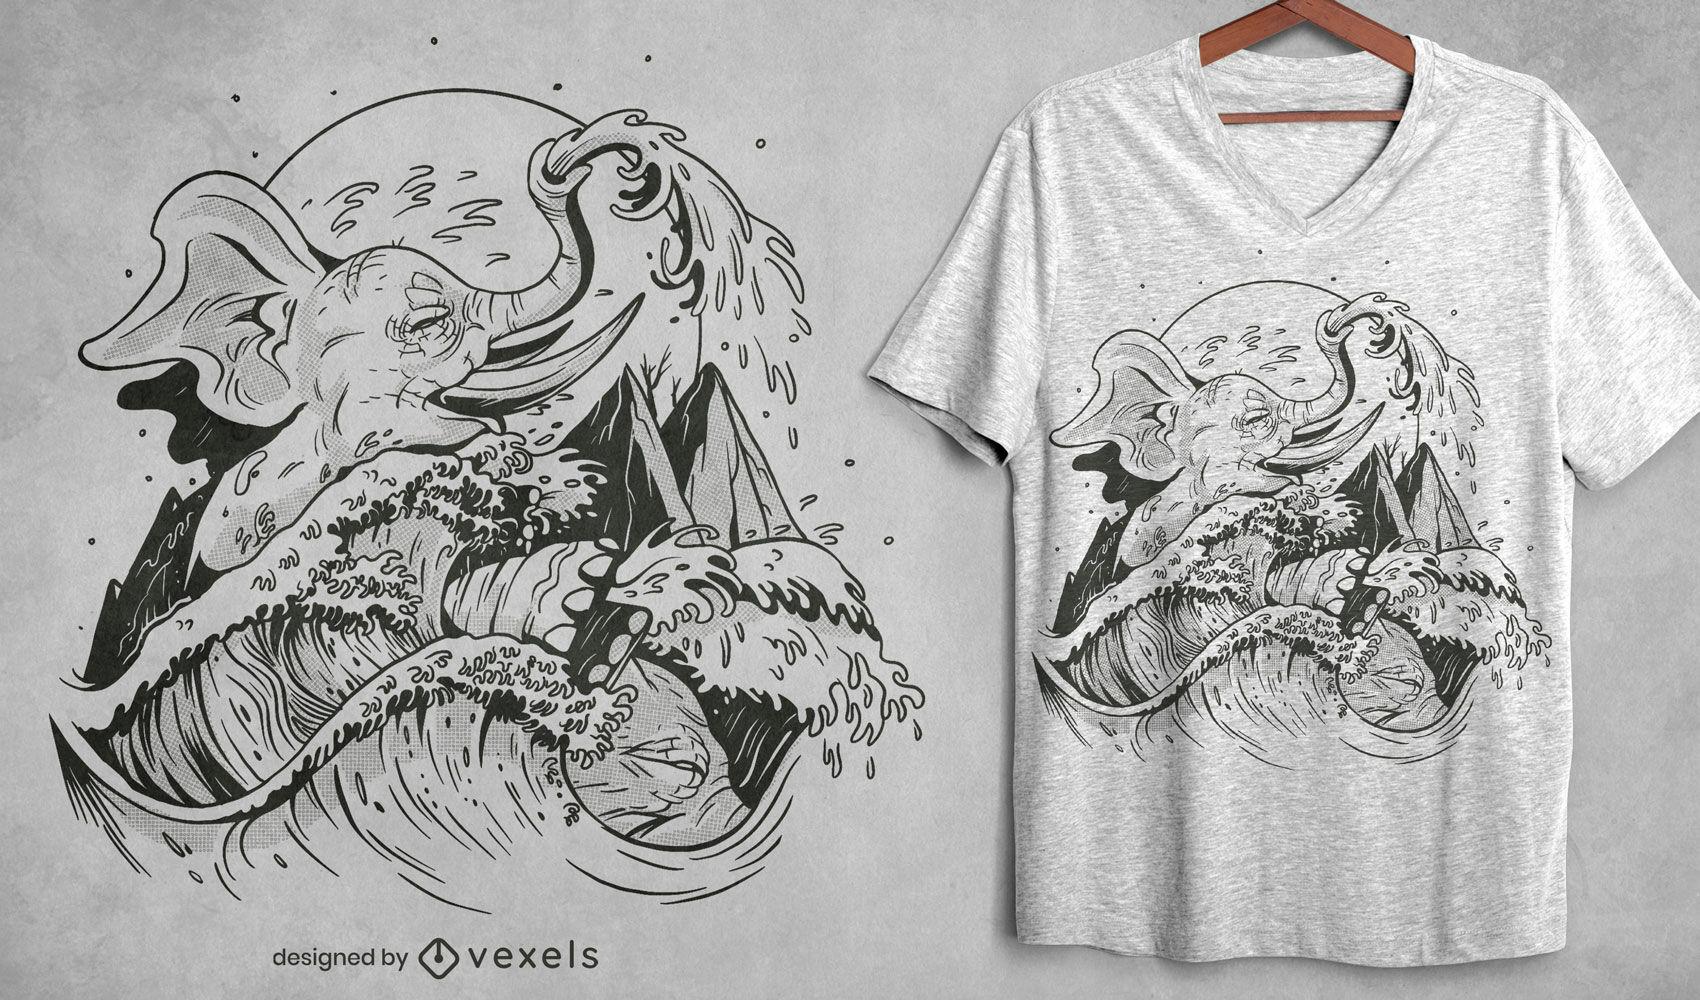 Dise?o de camiseta dibujada a mano elefante y ola.